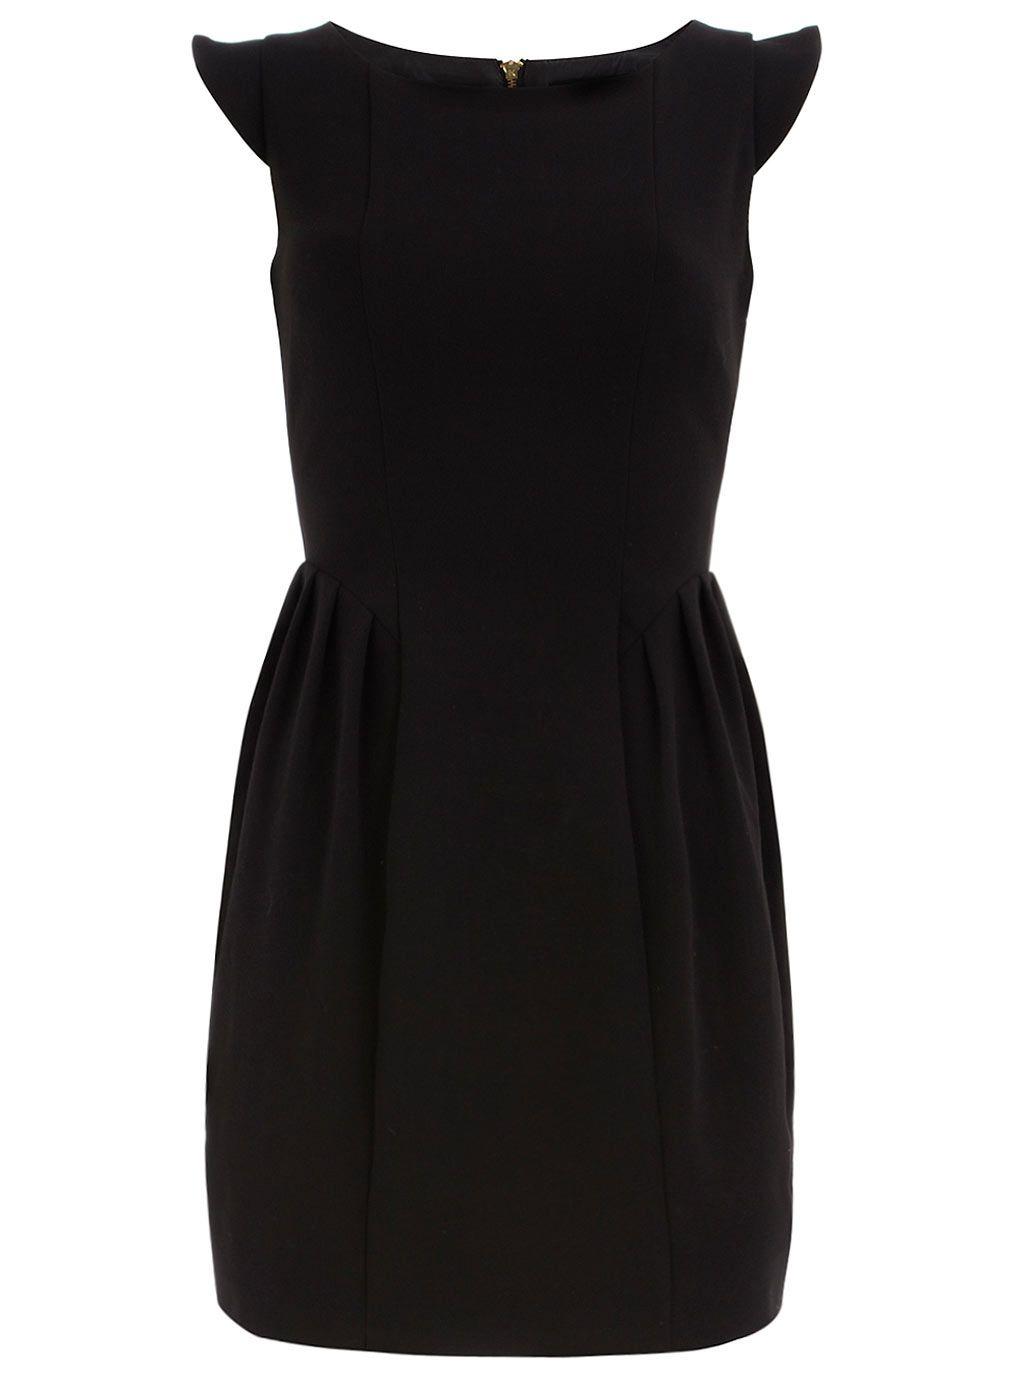 5ce43573031 little black dress for the office Black Tulips